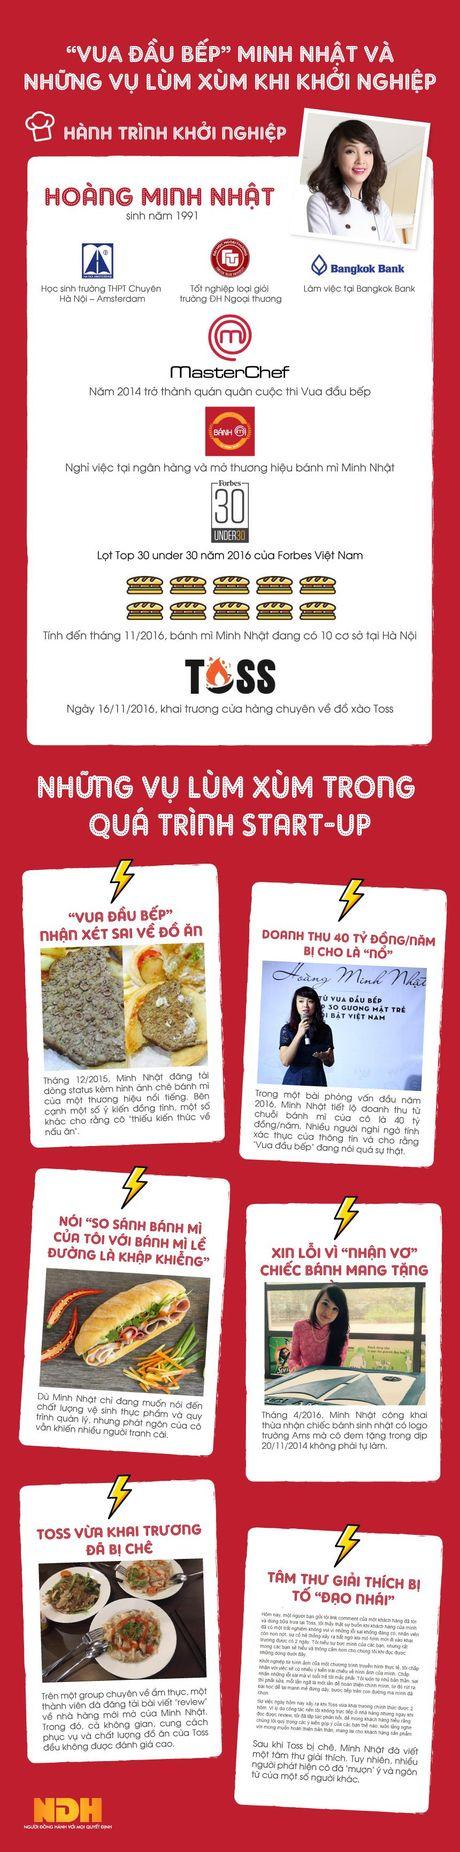 'Vua dau bep' Minh Nhat va nhung vu lum xum khi khoi nghiep - Anh 1